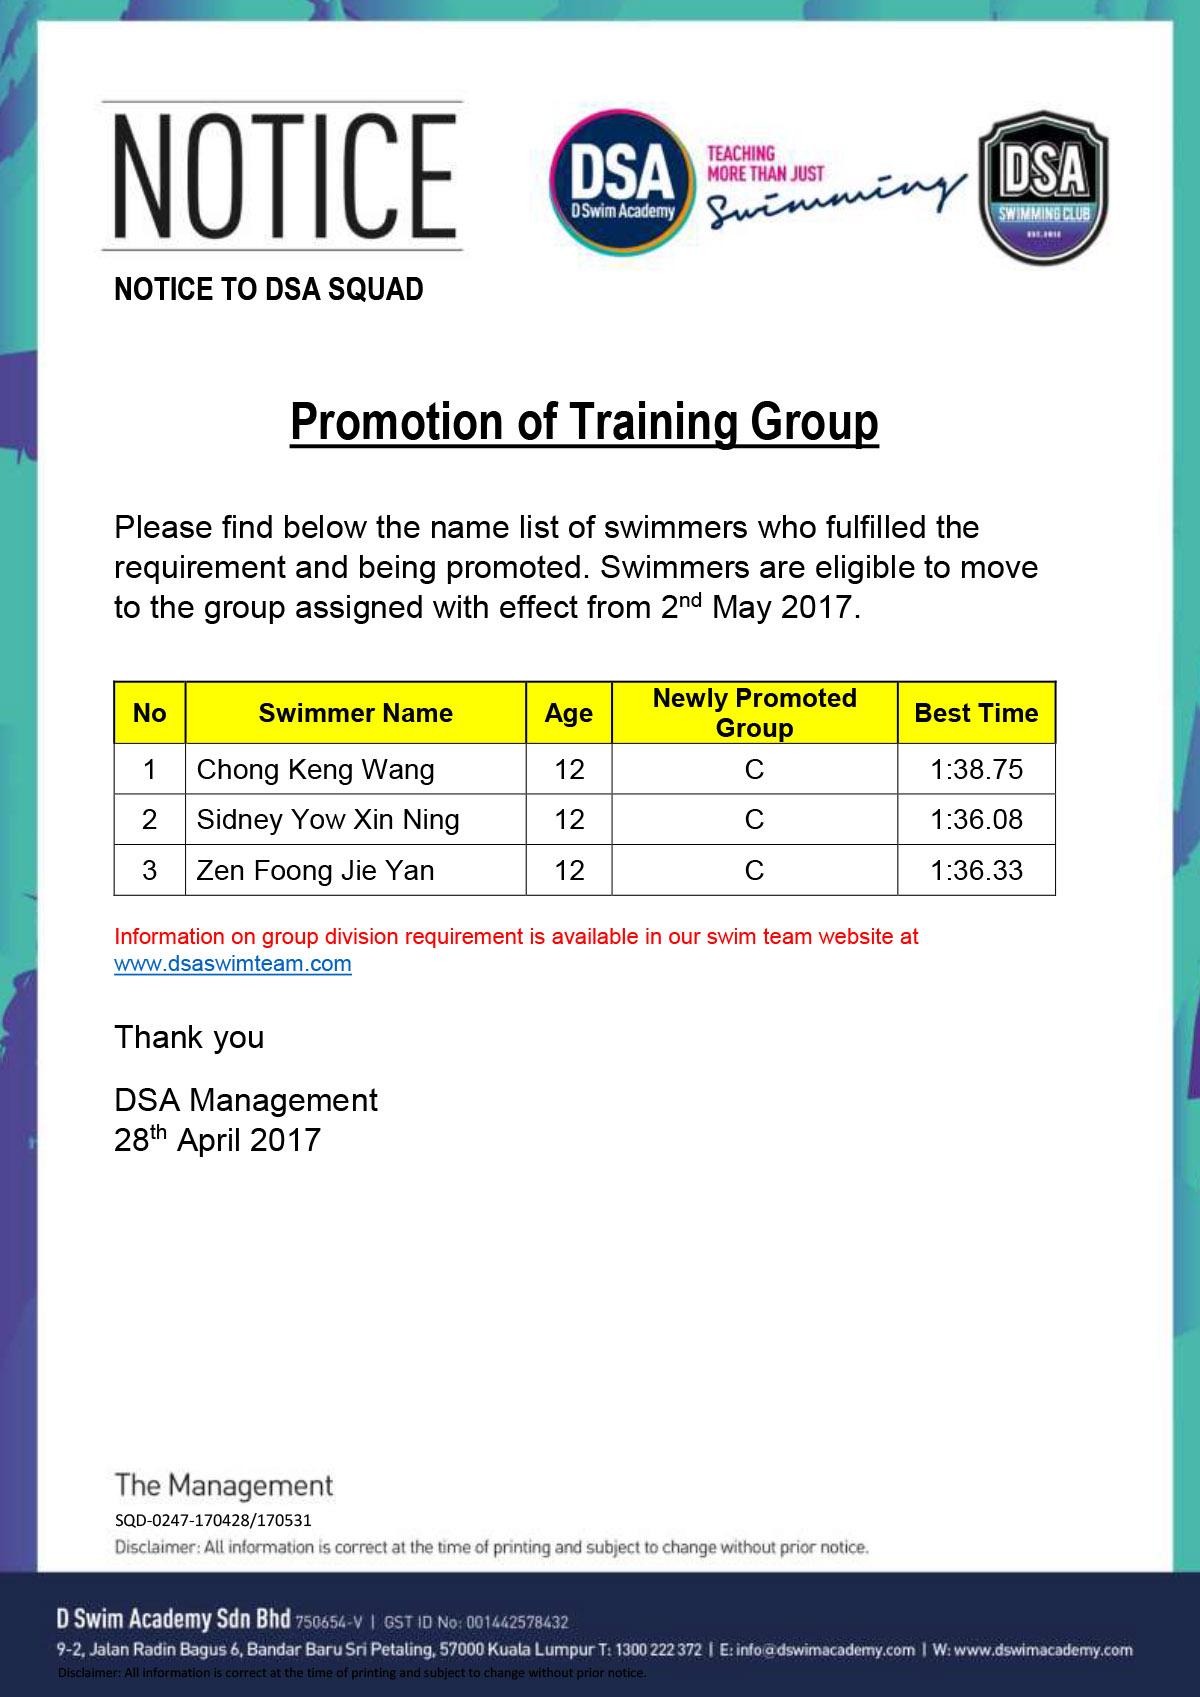 Promotion of Training Groups